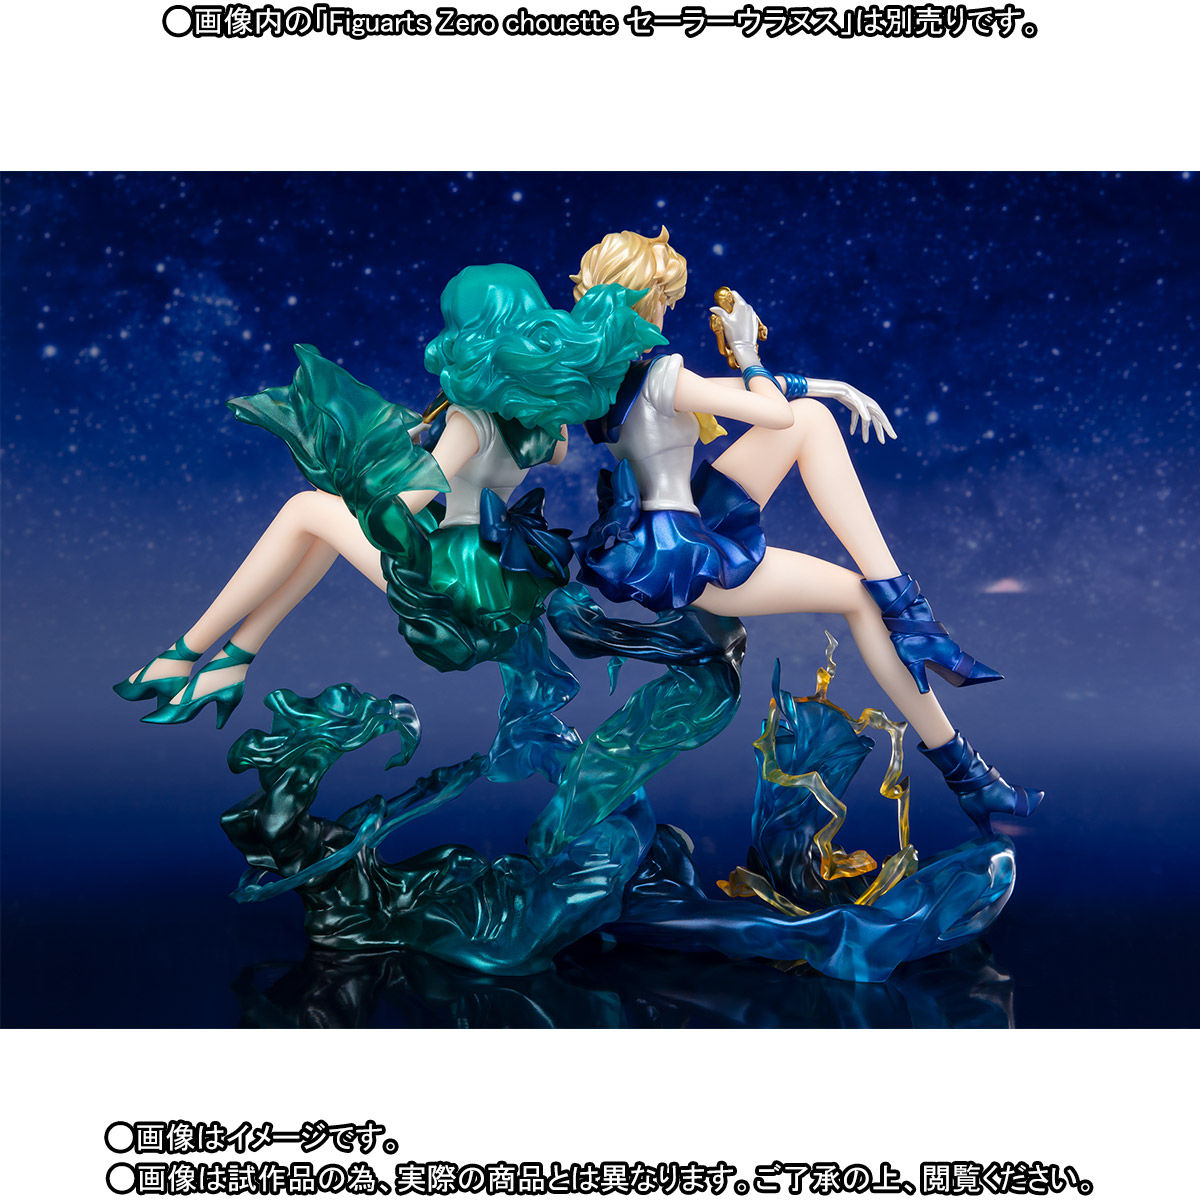 Figuarts Zero chouette『セーラーネプチューン』美少女戦士セーラームーン 完成品フィギュア-005